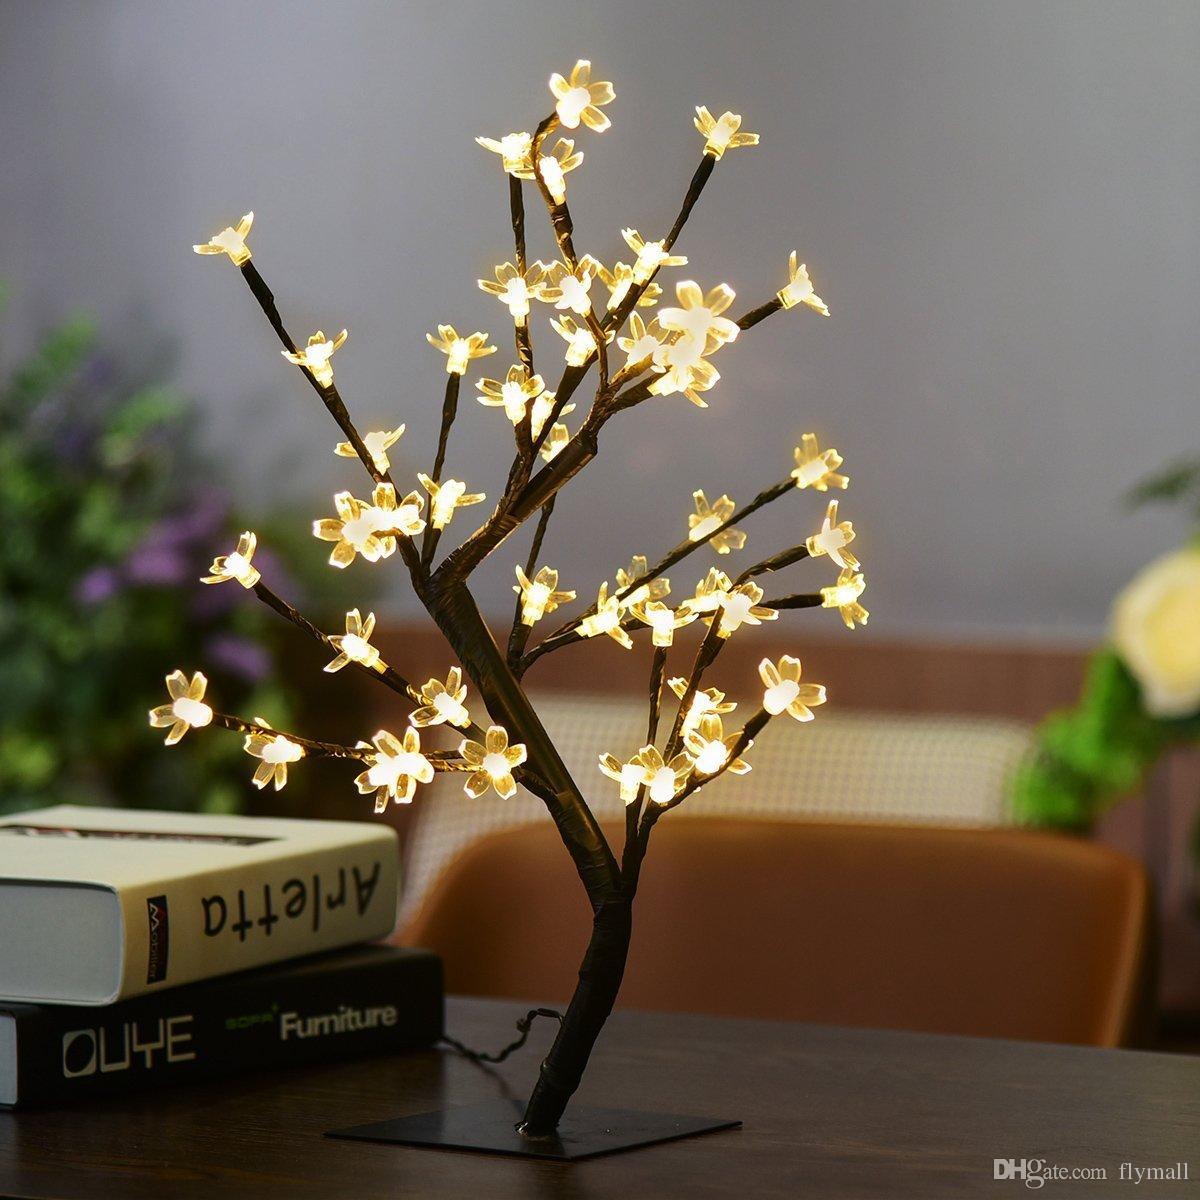 Crystal Cherry Blossom 48 LEDs Tree Light Night Lights Table Lamp 45cm Black Branches Lighting Christmas Party Wedding LED Flowers Lights